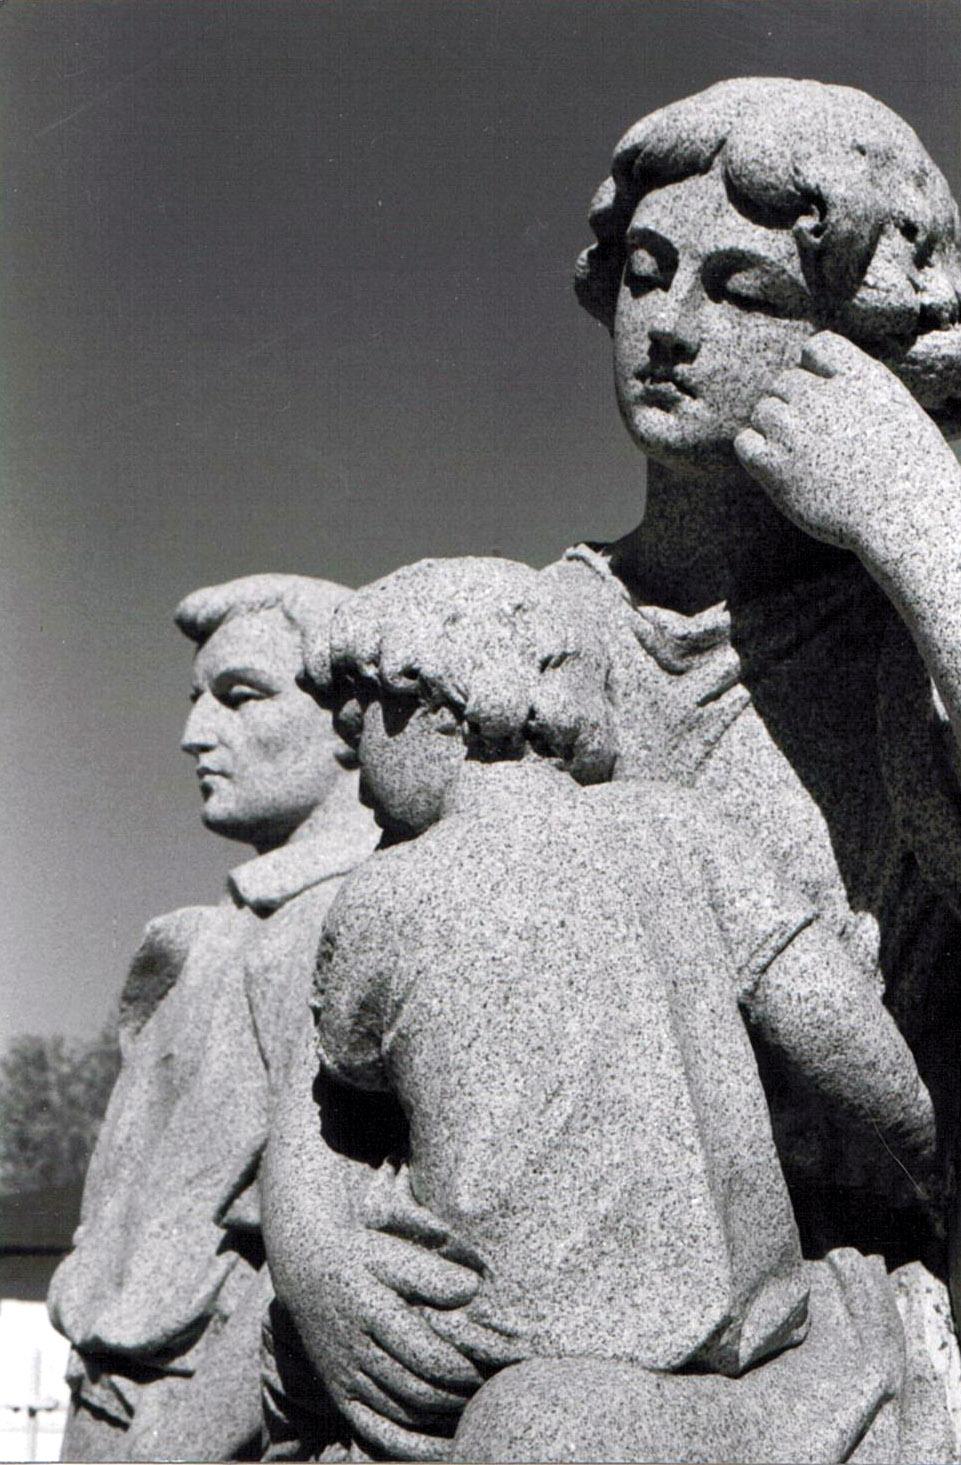 Centenary of Ludlow Massacre